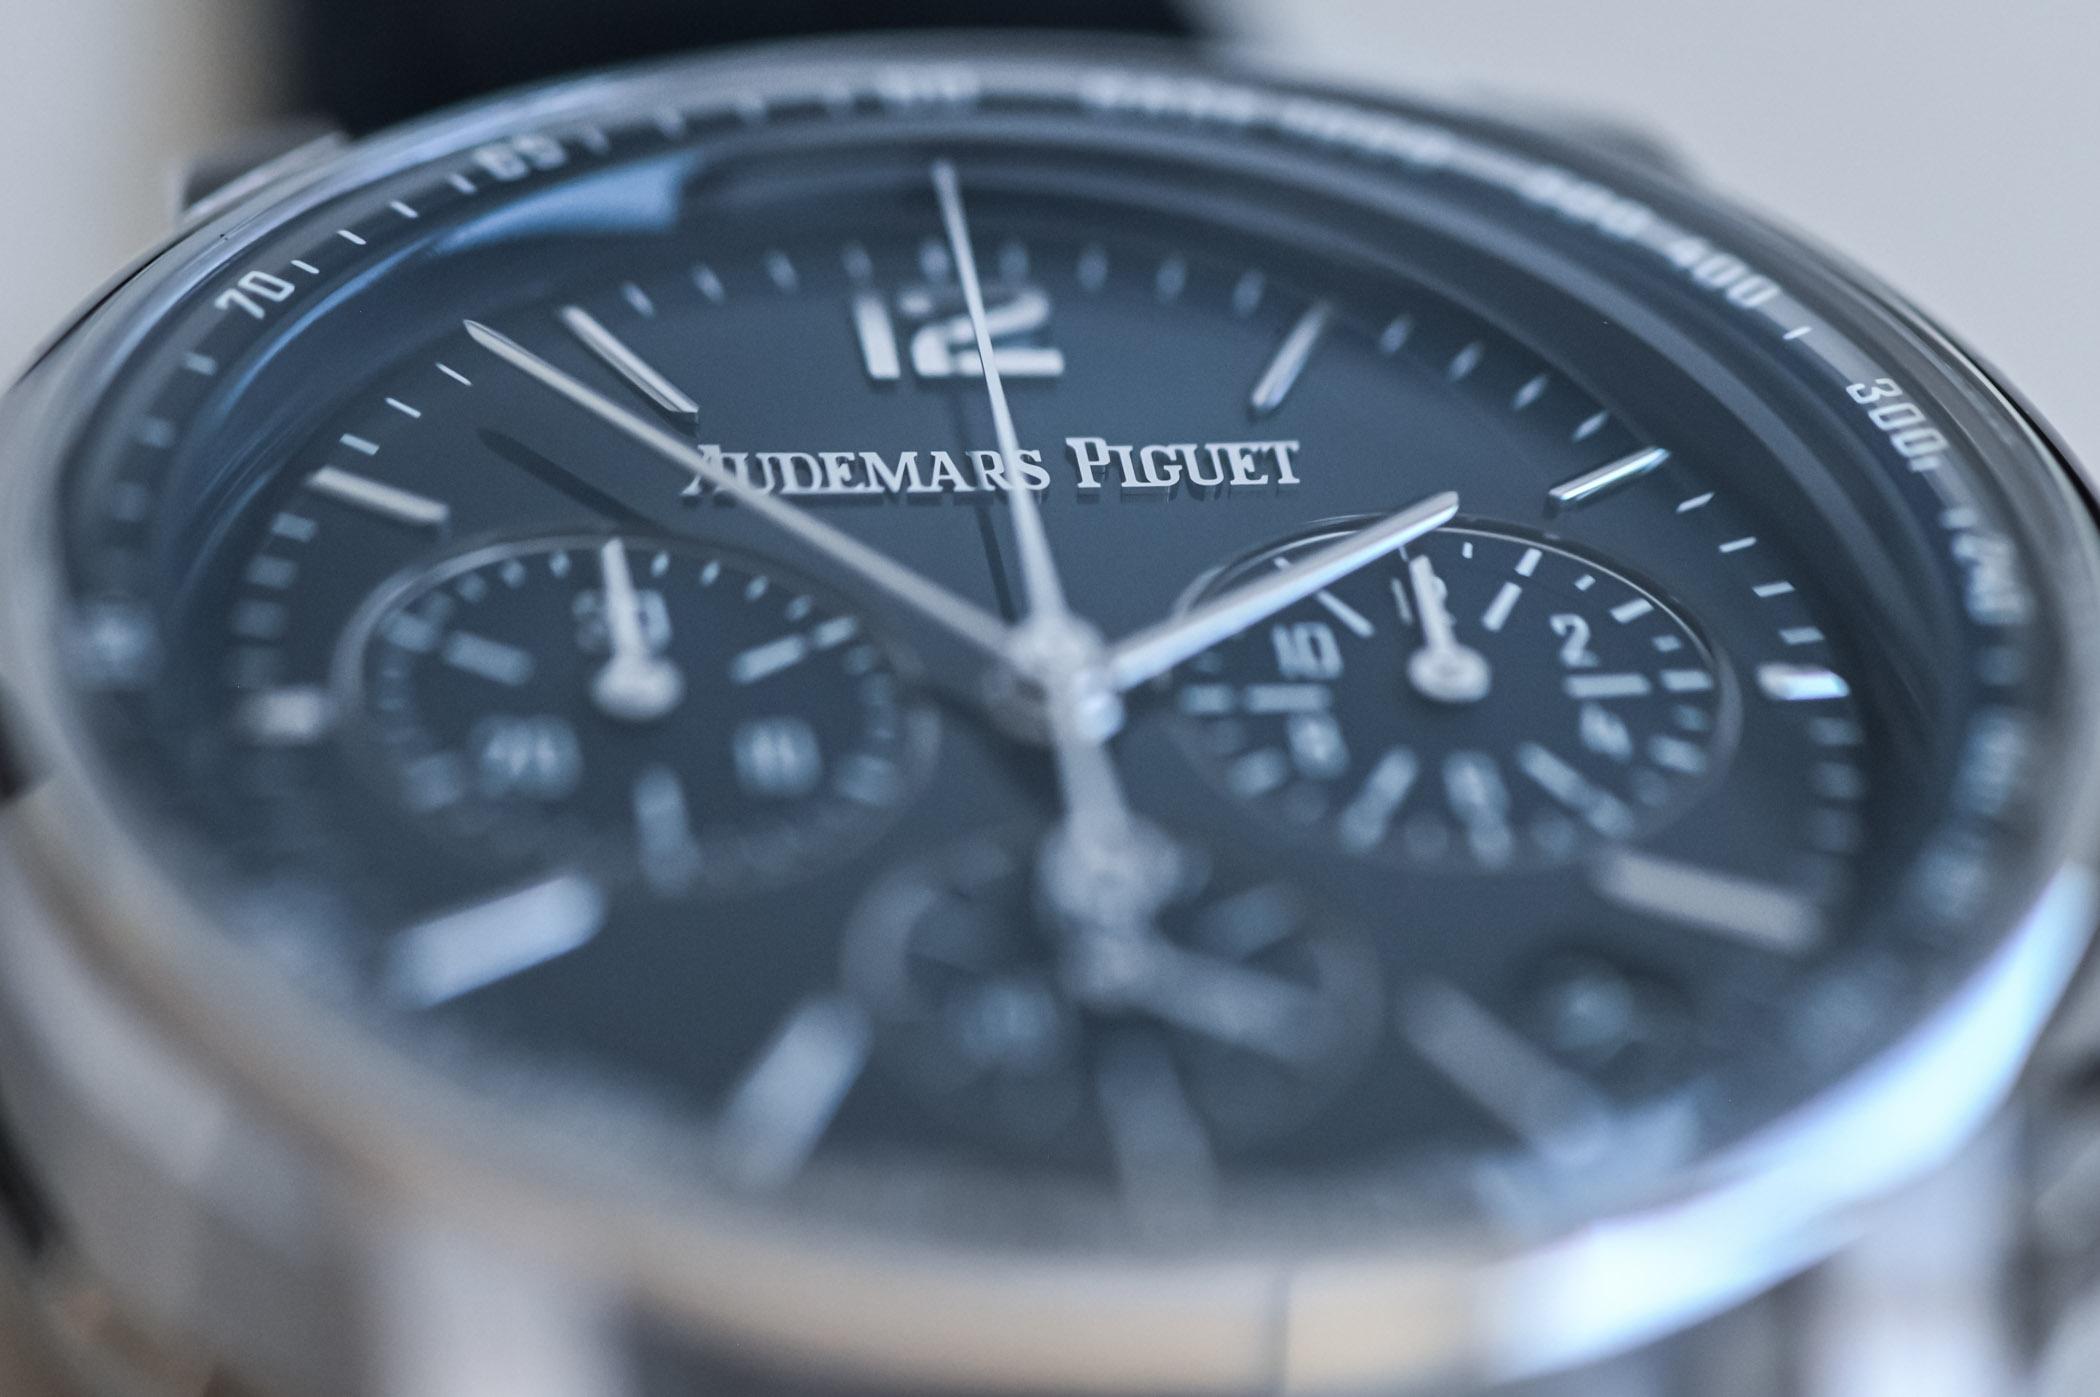 Code 11.59 by Audemars Piguet Selfwinding Chronograph Review - dial